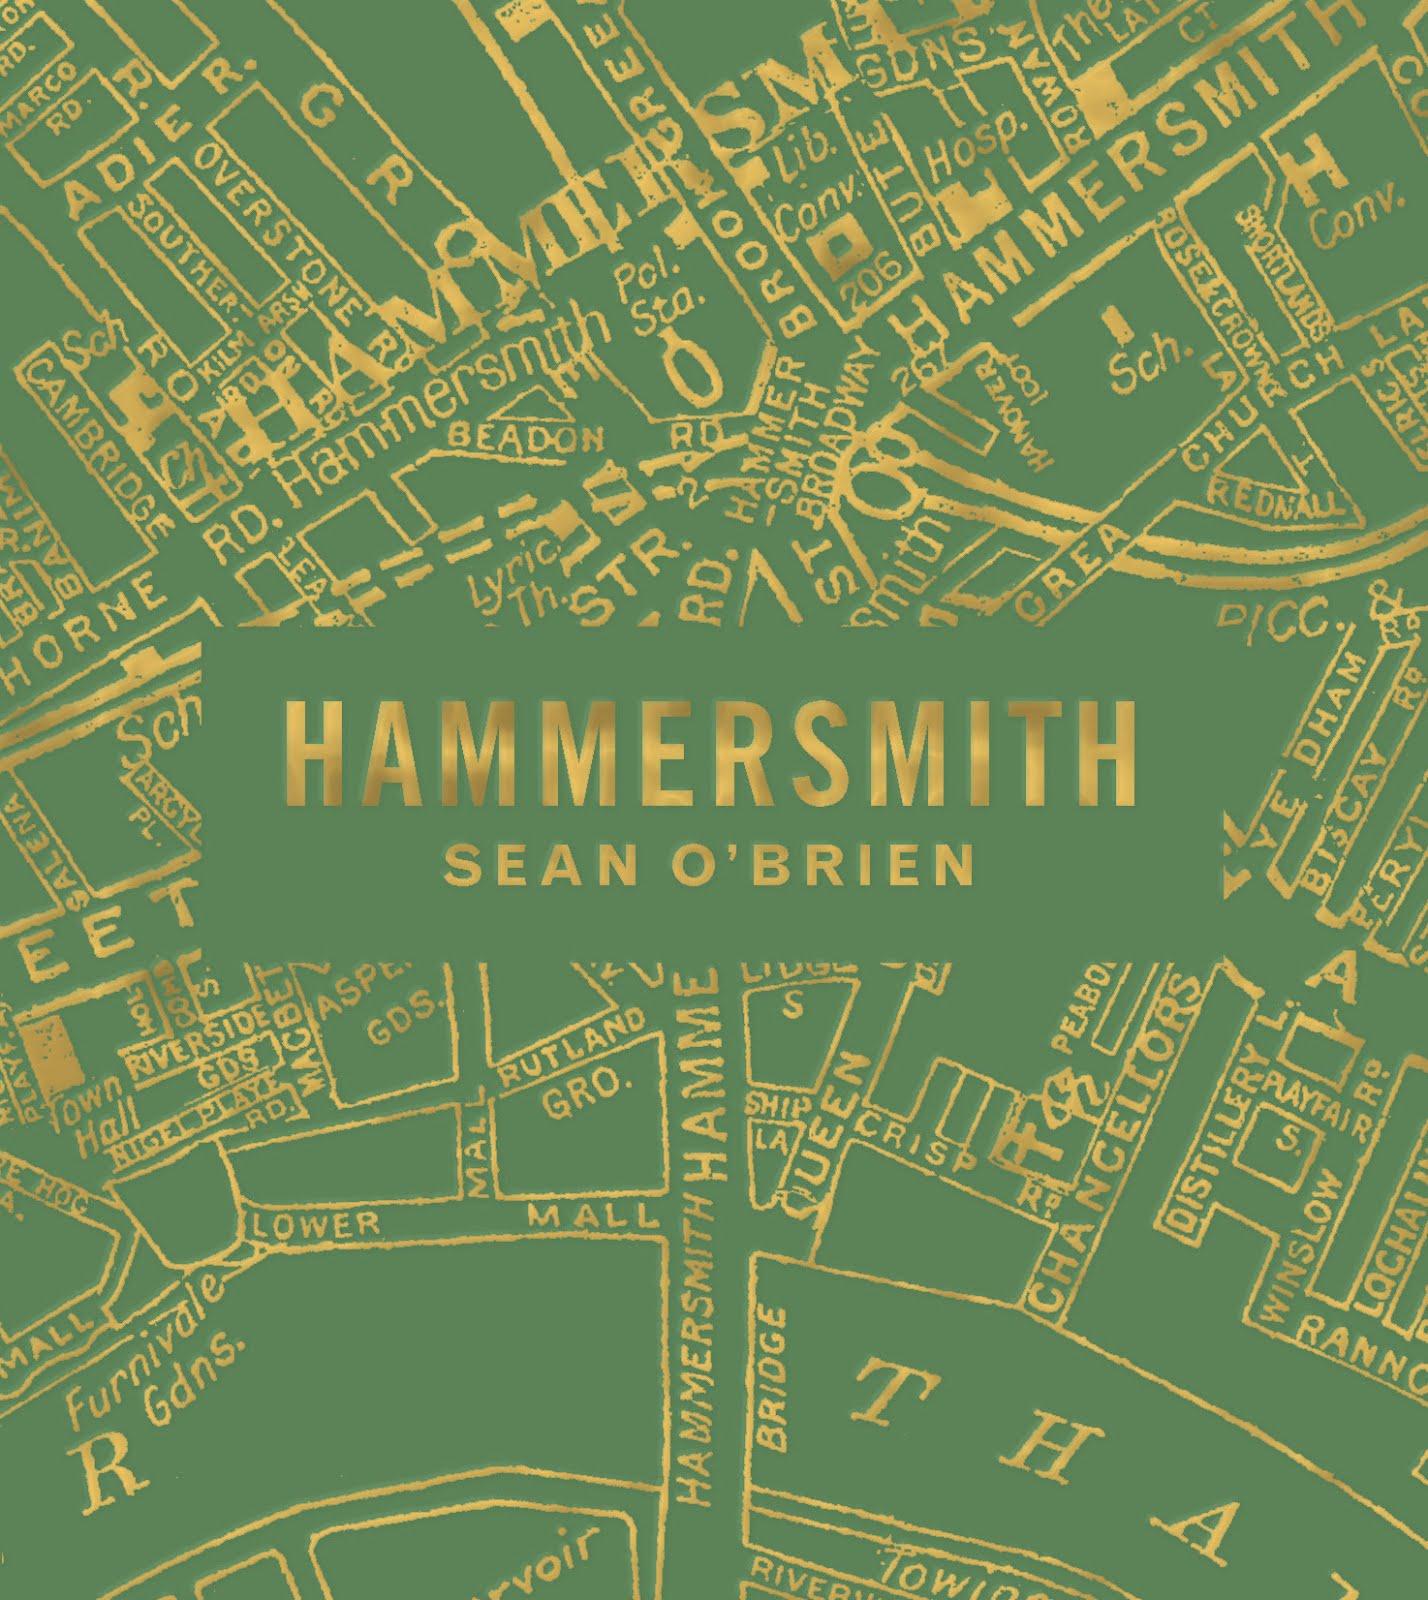 Hammersmith chapbook